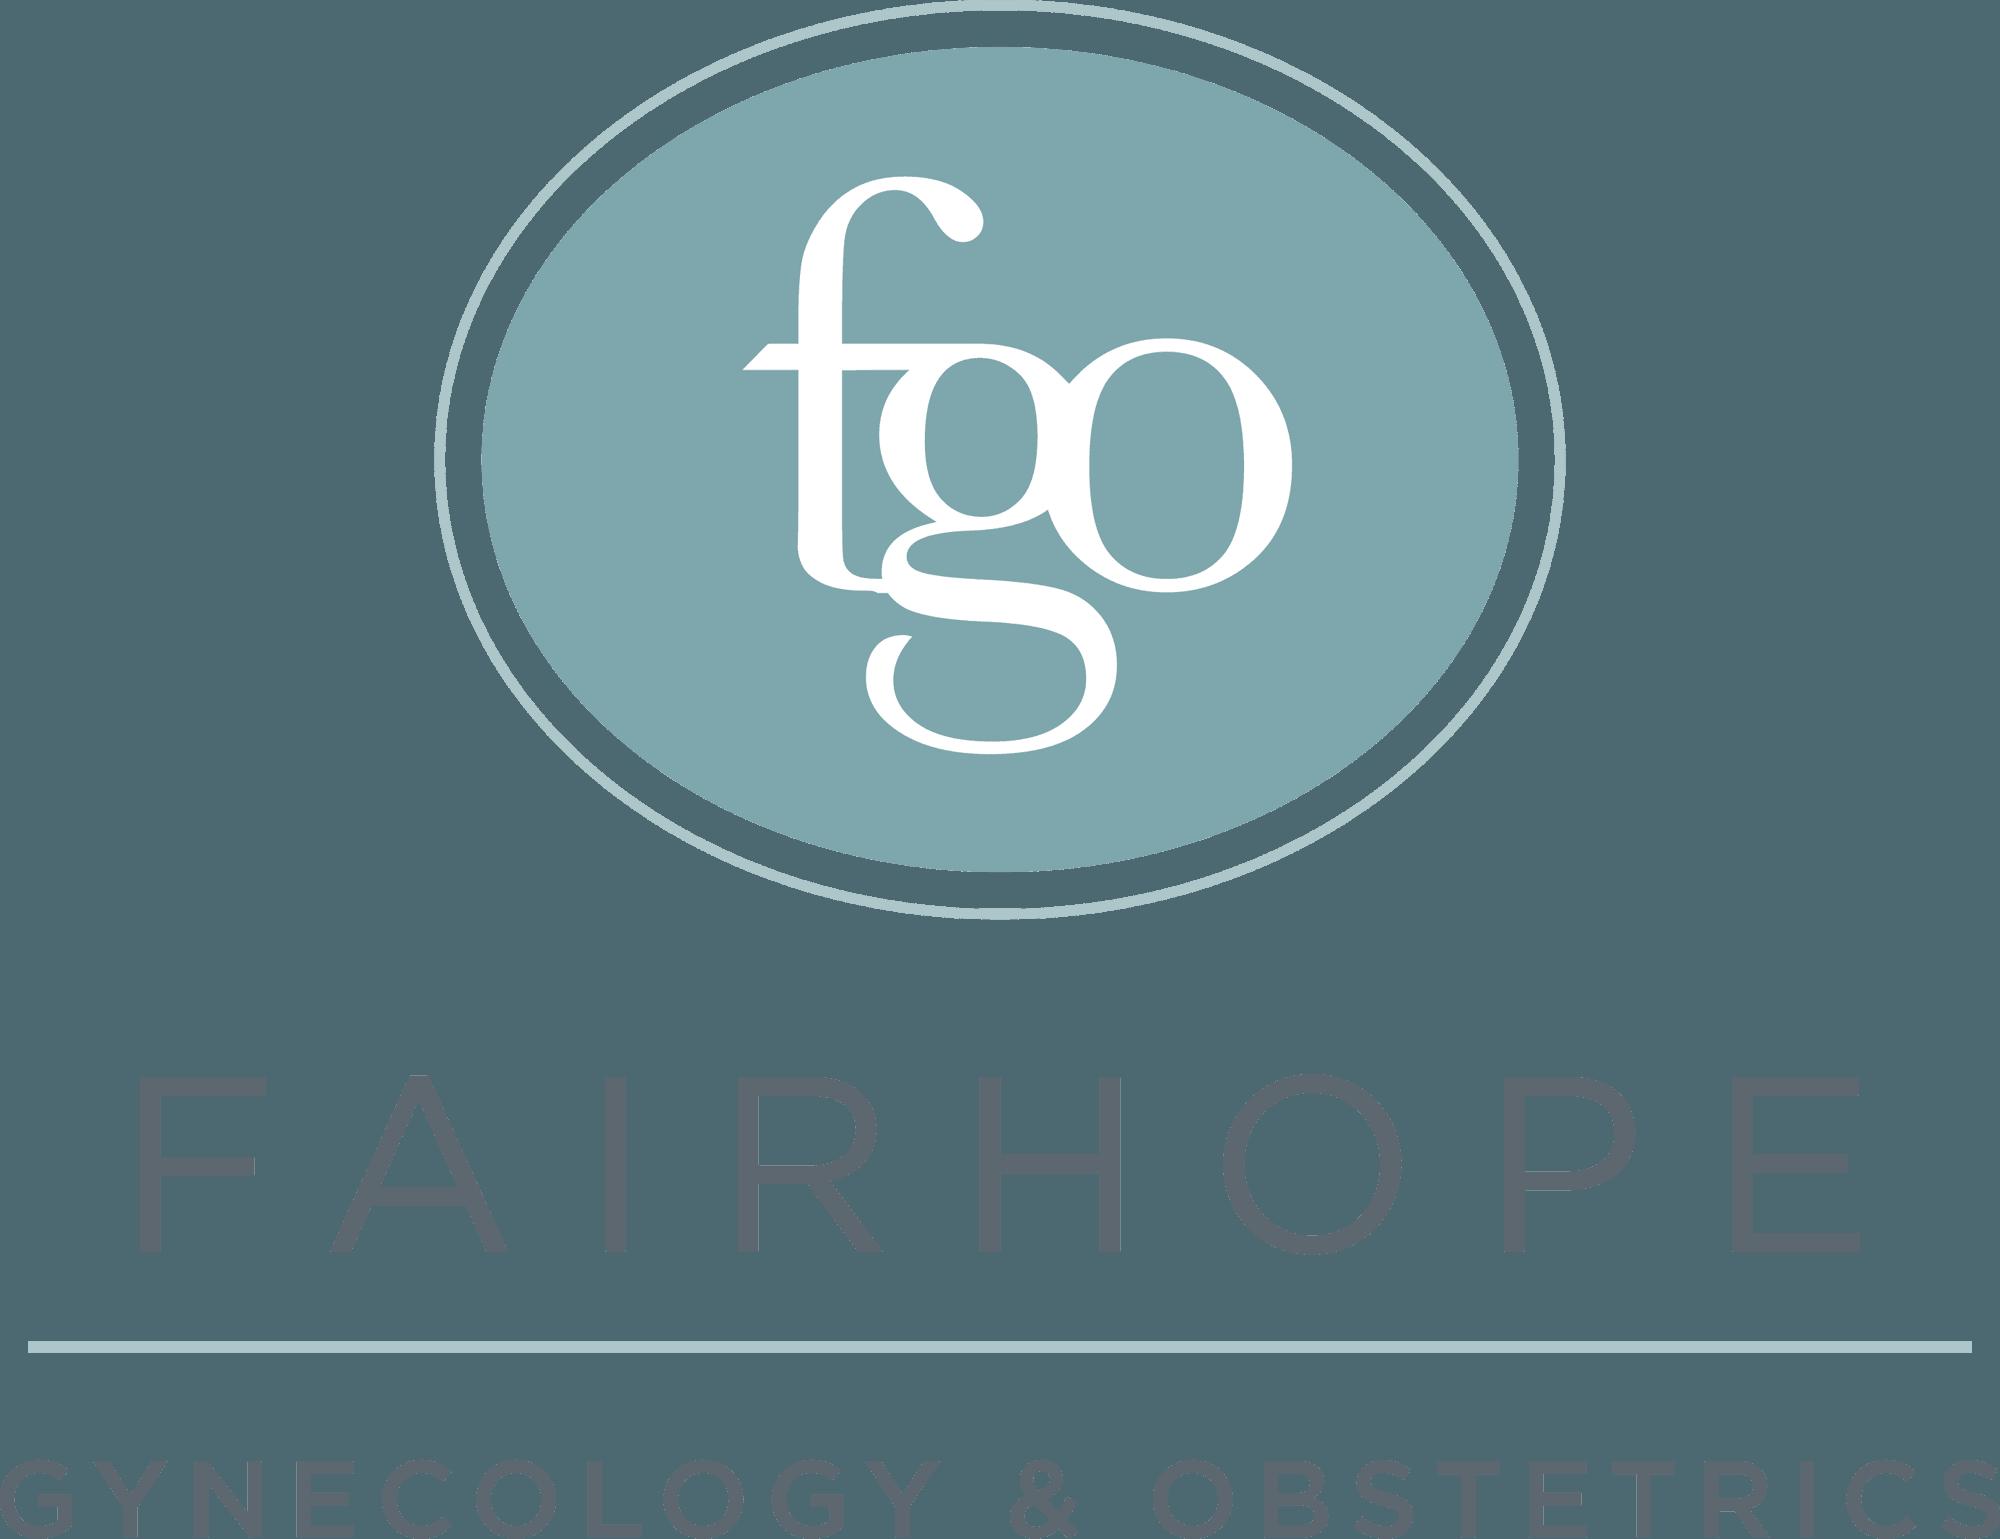 OB/GYN - Fairhope Gynecology & Obstetrics - Alabama